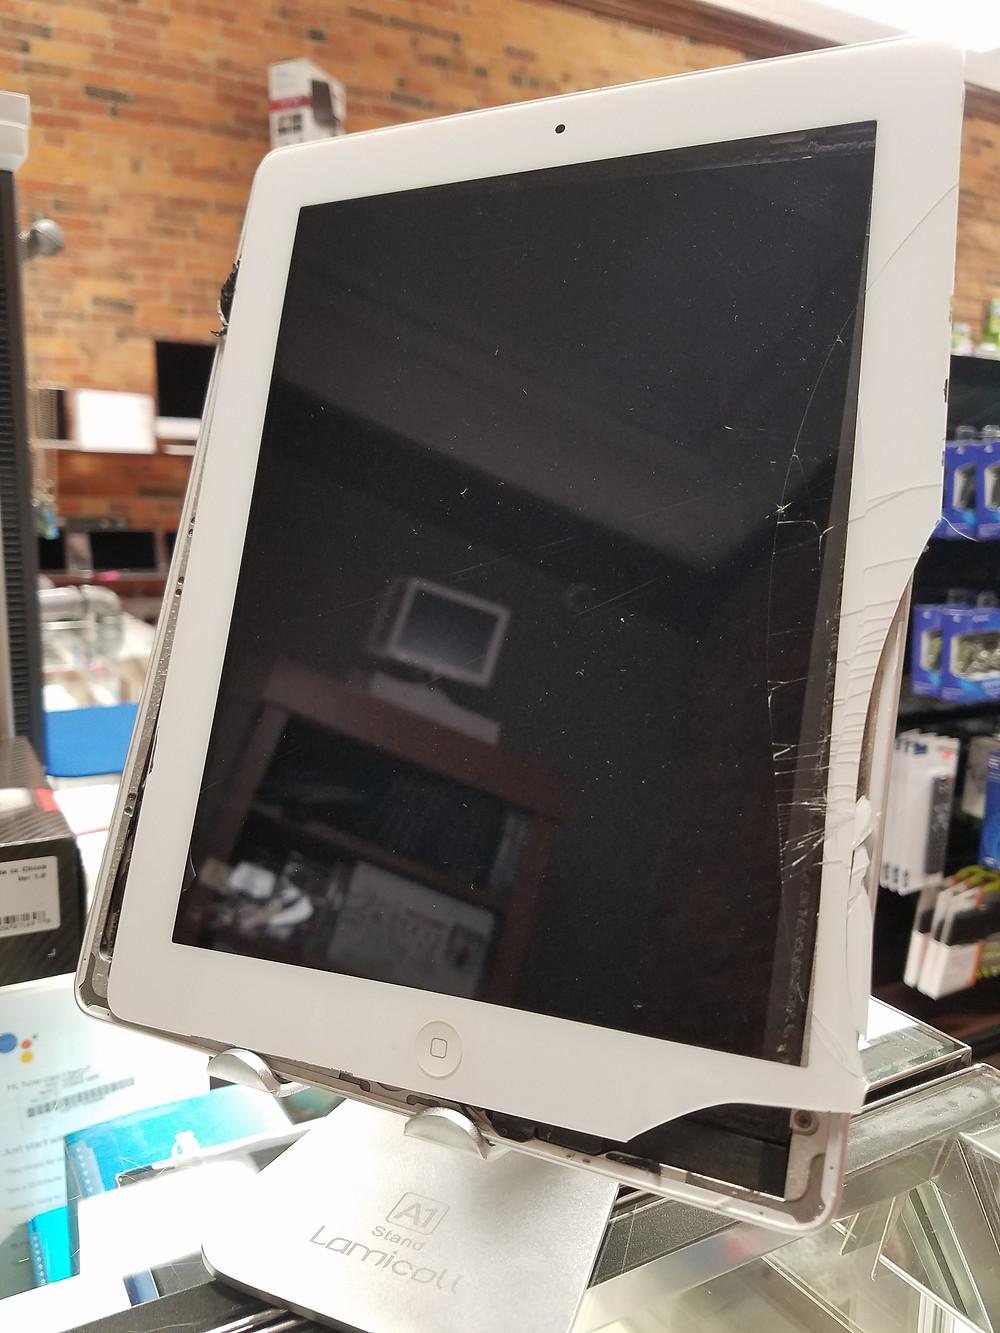 Broken screen on an iPad 2